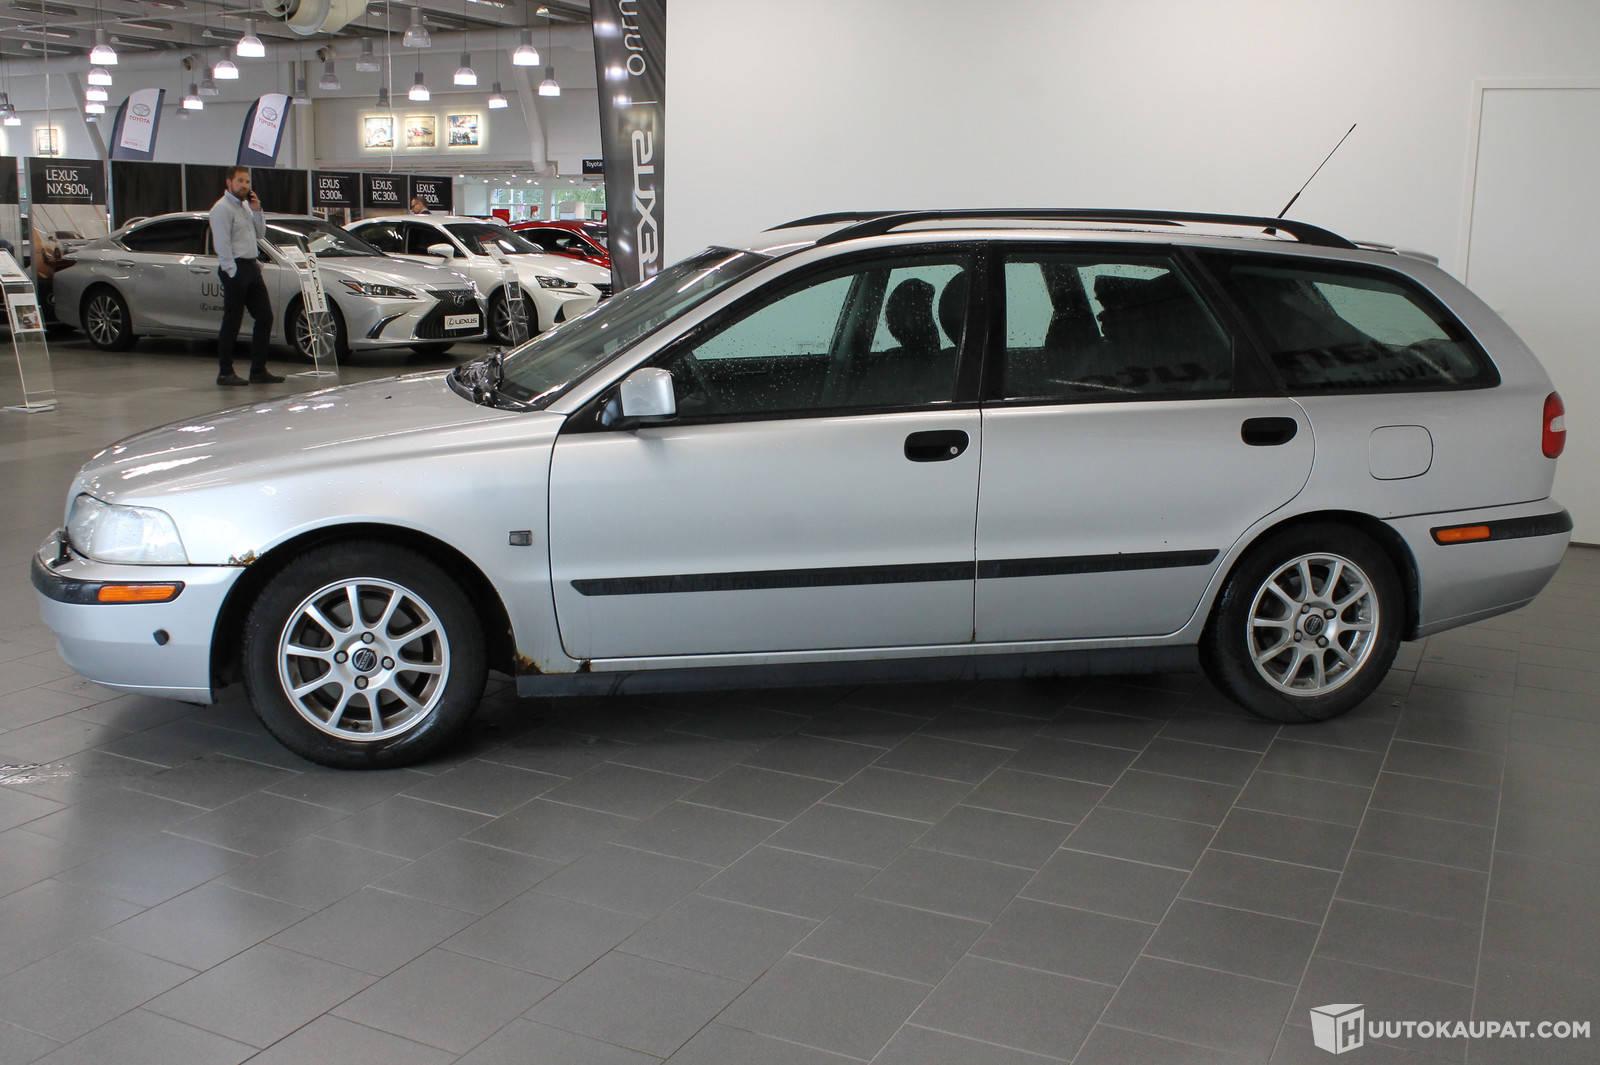 Volvo 5d V40 Wagon 2 0 Turbo Automatic 2000 2 0 L Bensiini 263 Km